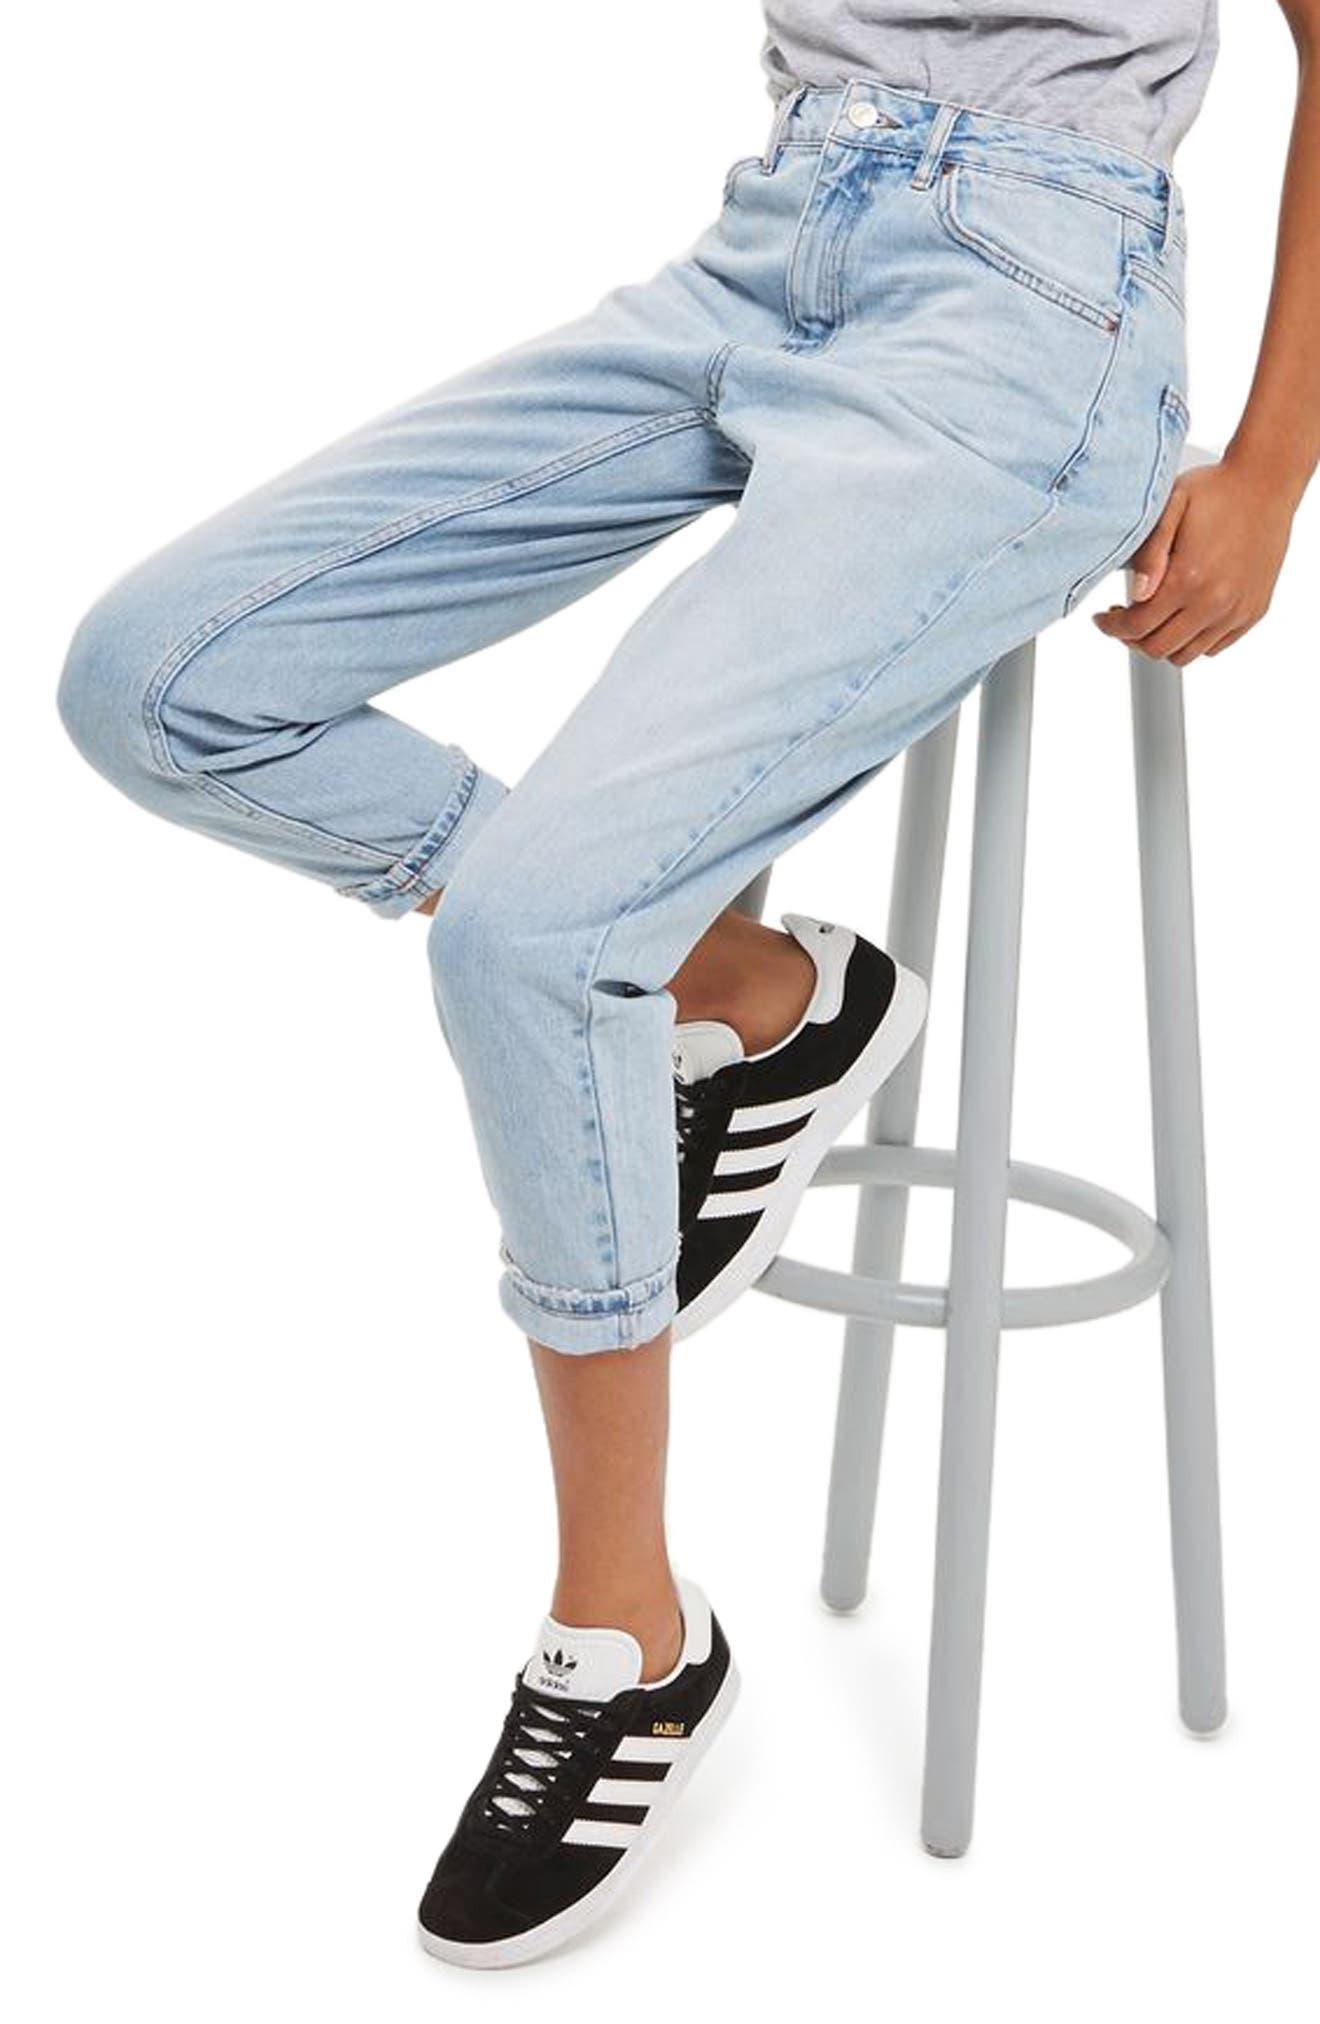 Alternate Image 1 Selected - Topshop Mom Jeans (Petite)